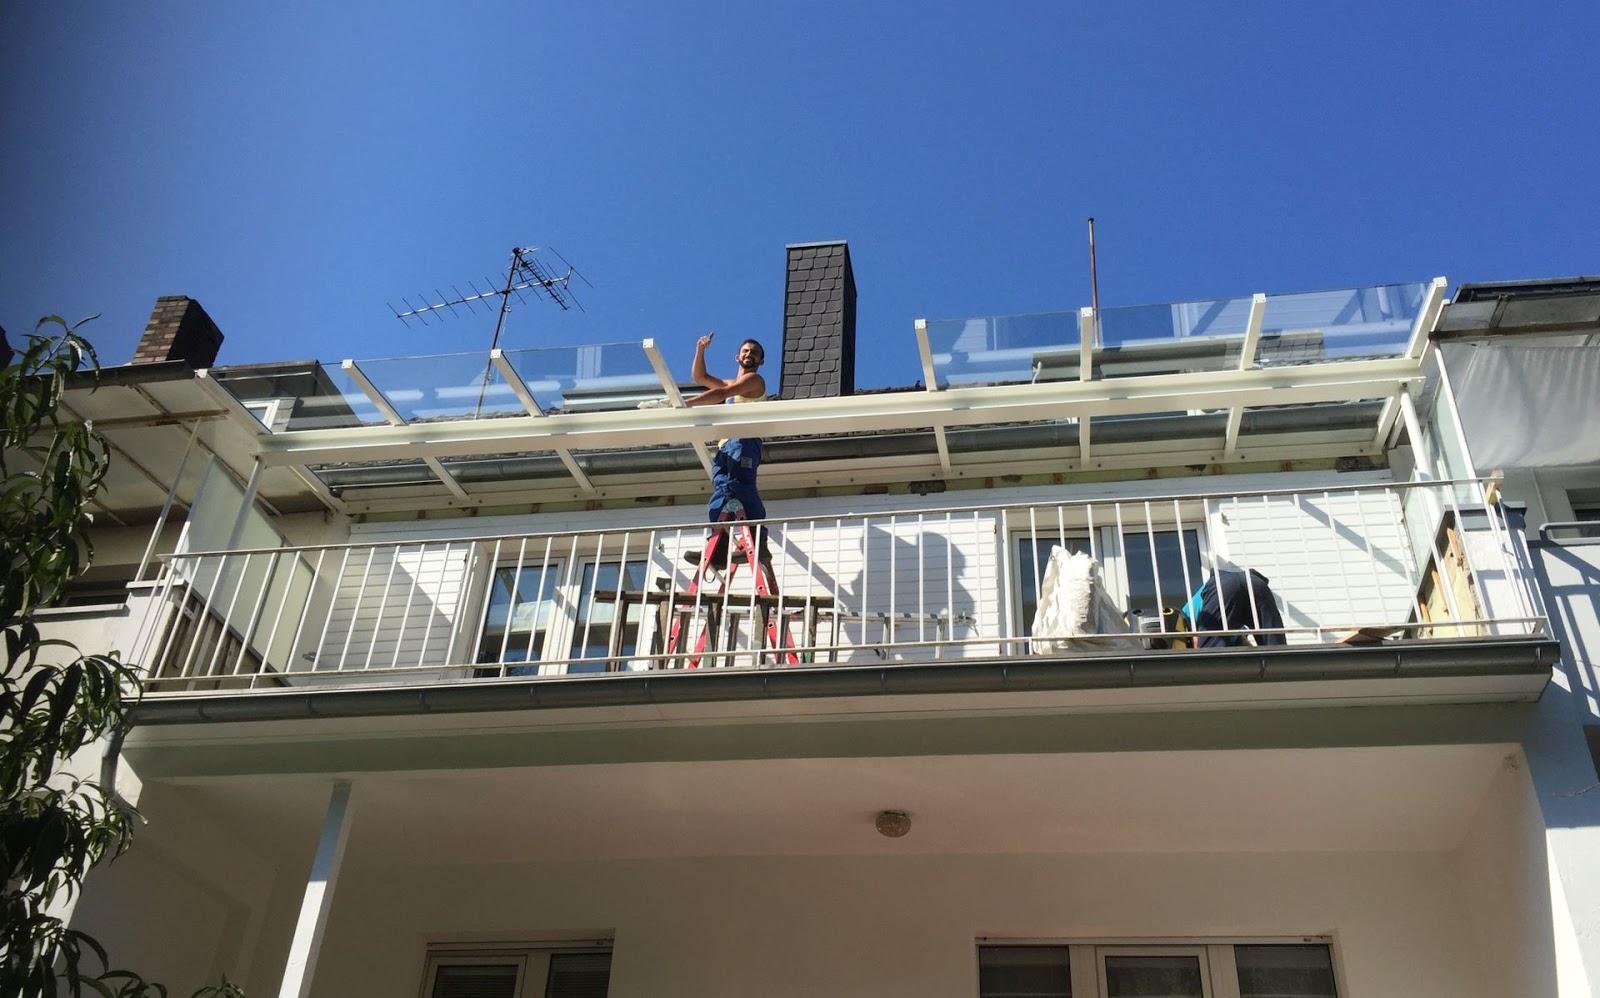 Uberdachung Dachterrasse